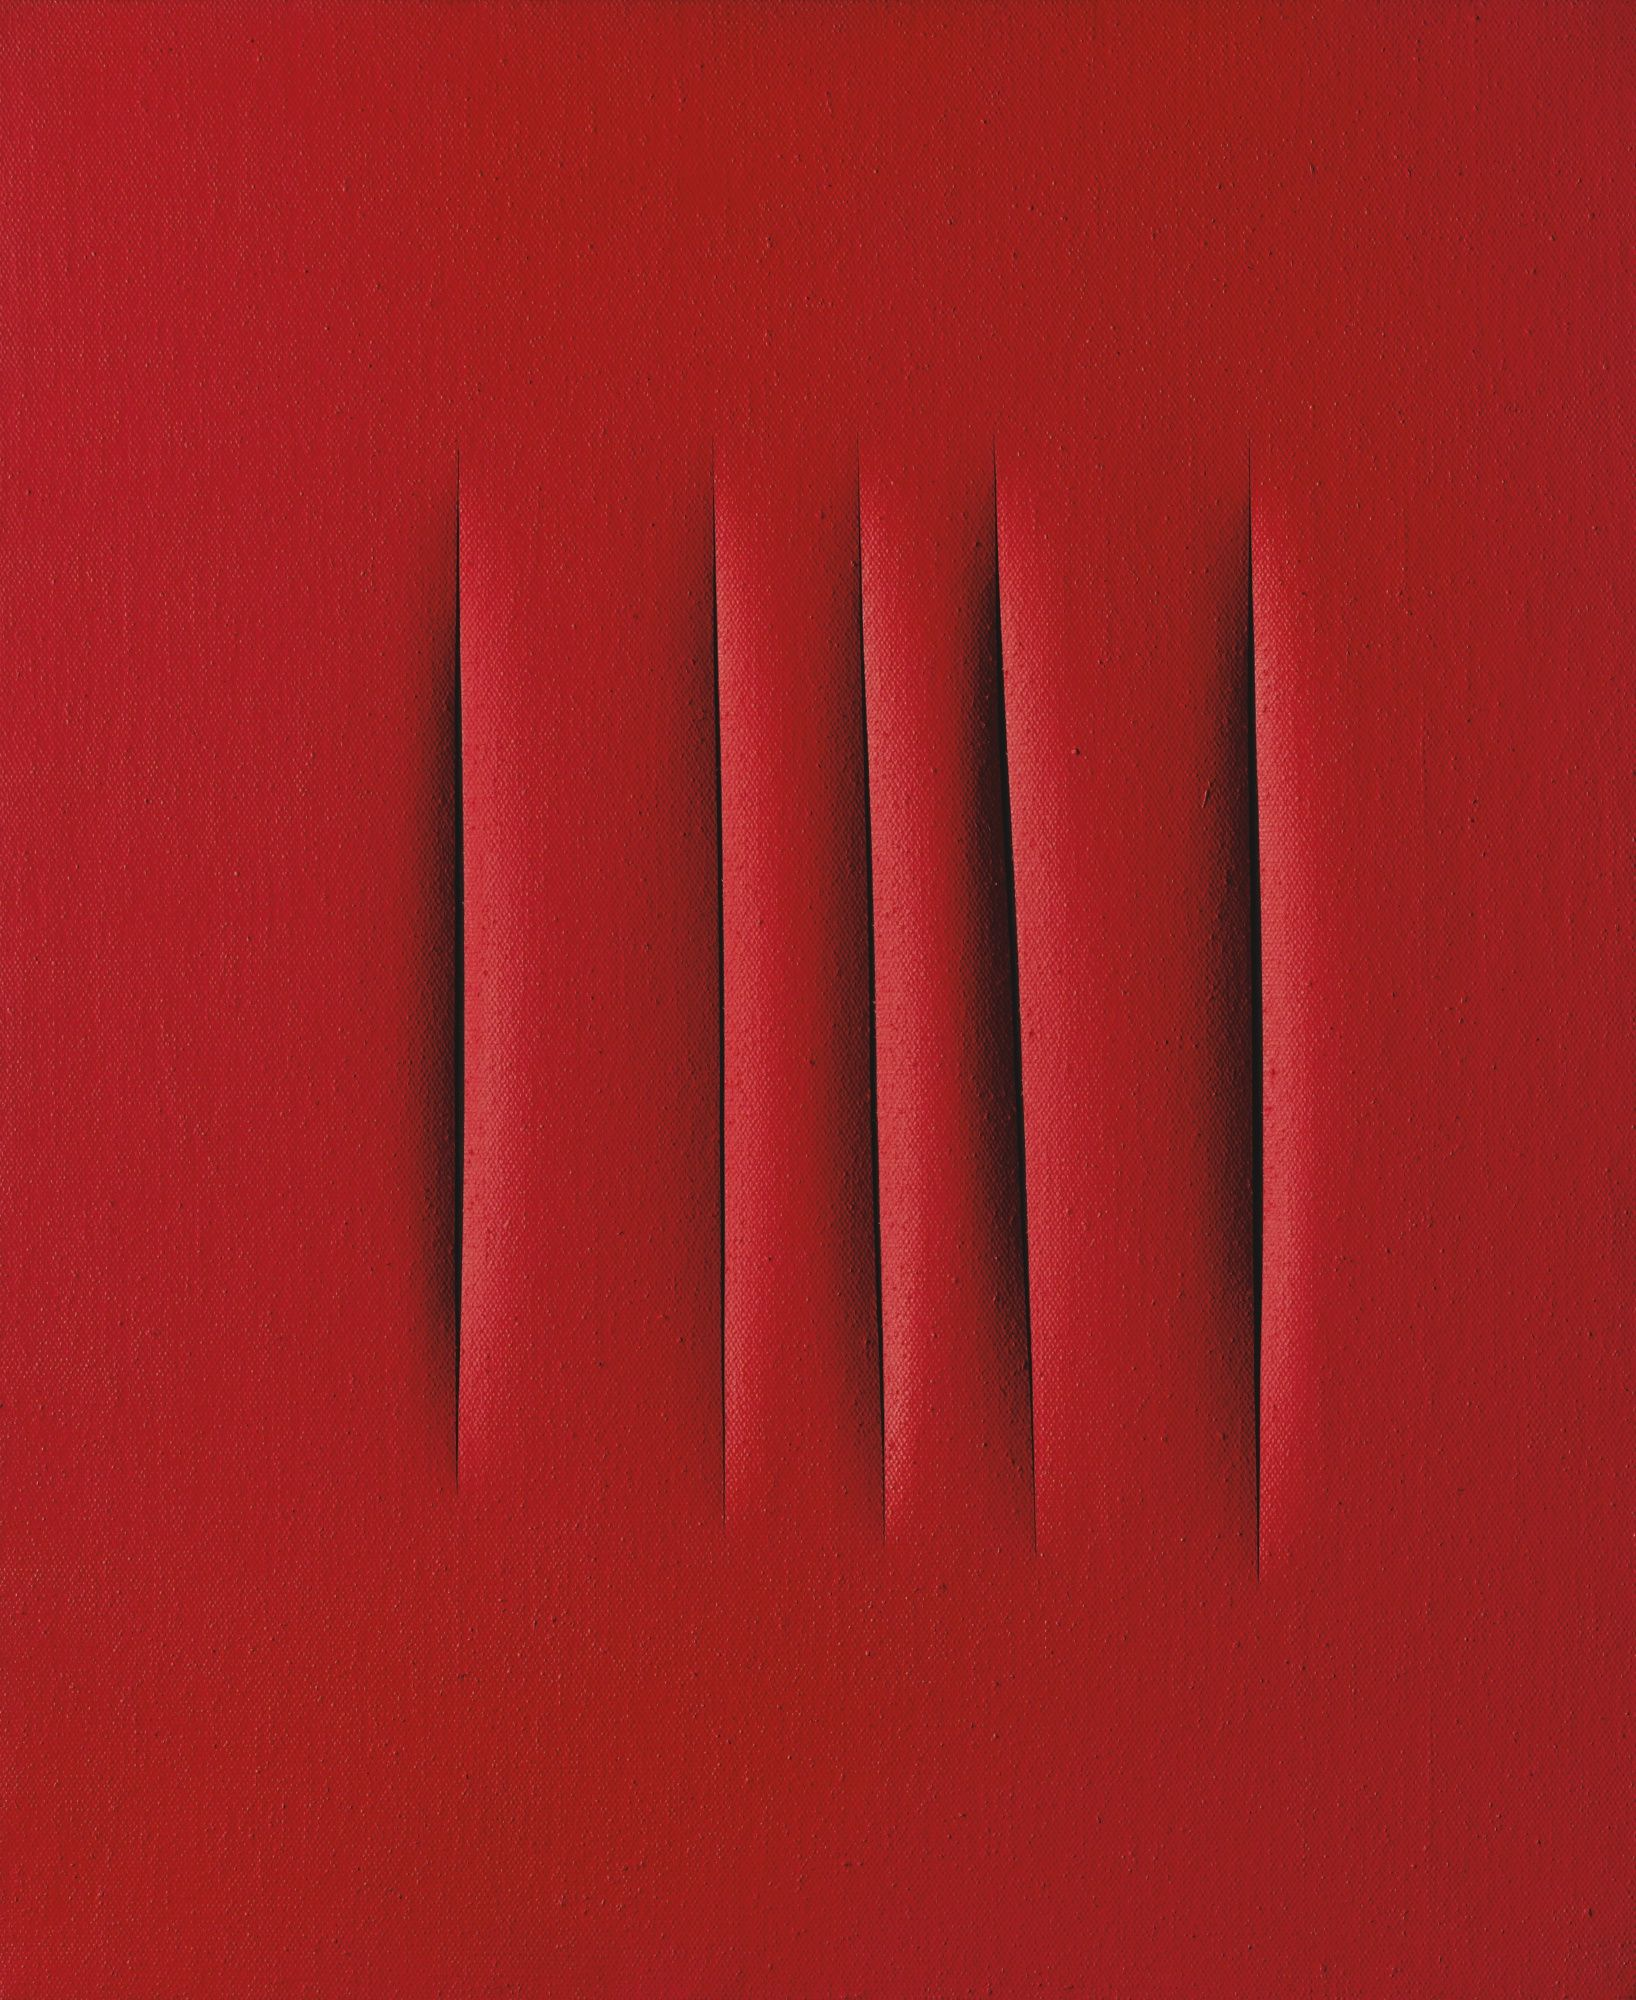 Lucio Fontana Concetto Spaziale Attese 1965 Waterpaint On Canvas 72 X 60 Cm Est Hk 15 24 Million Us 1 9 Contemporary Art Art For Sale Lucio Fontana